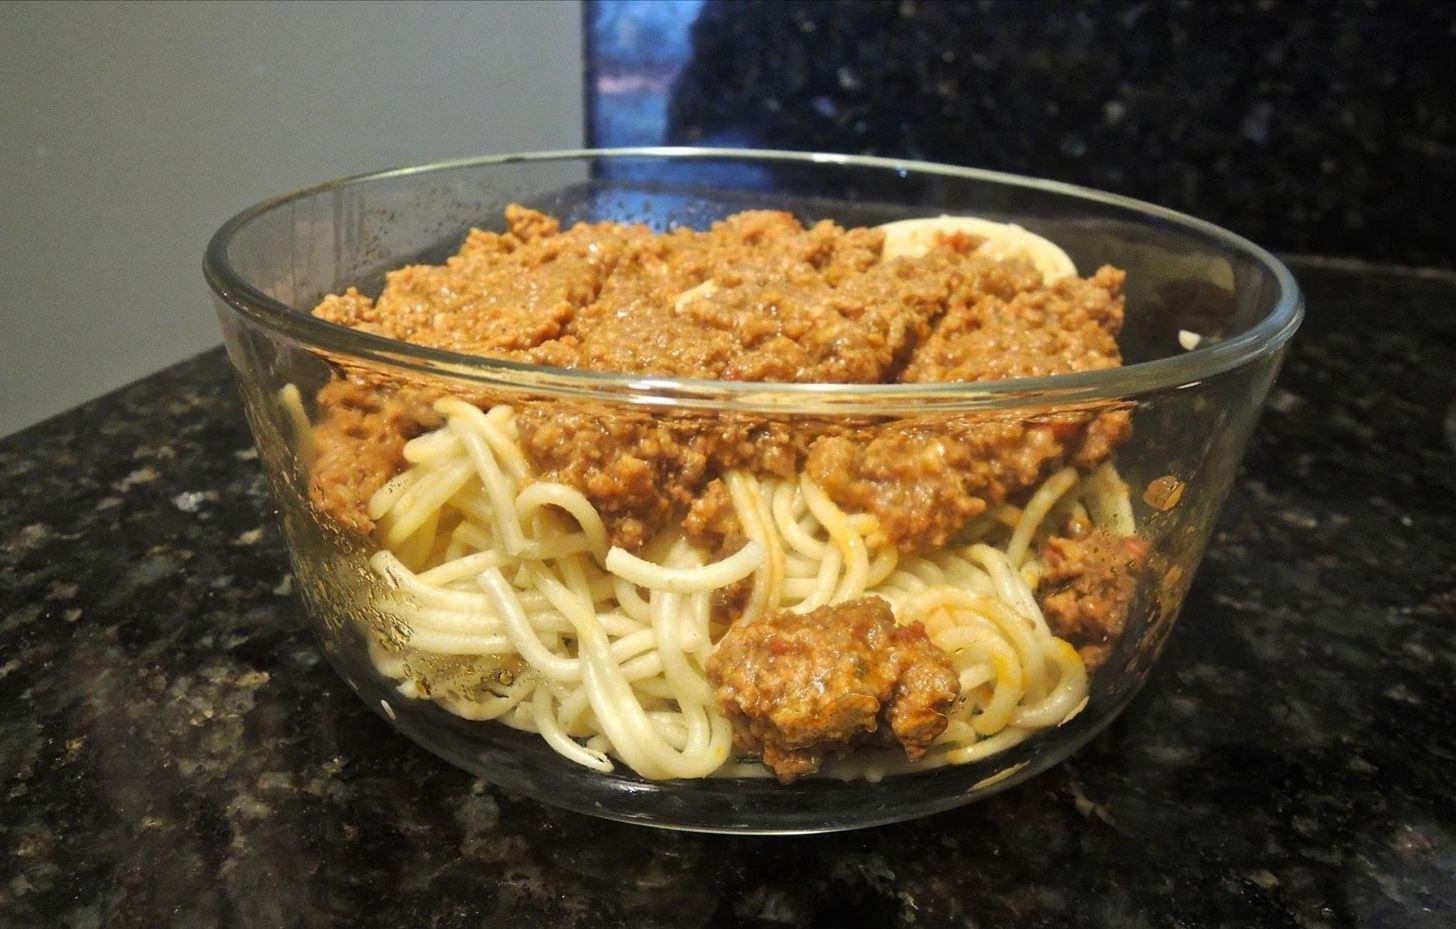 microwave food hacks